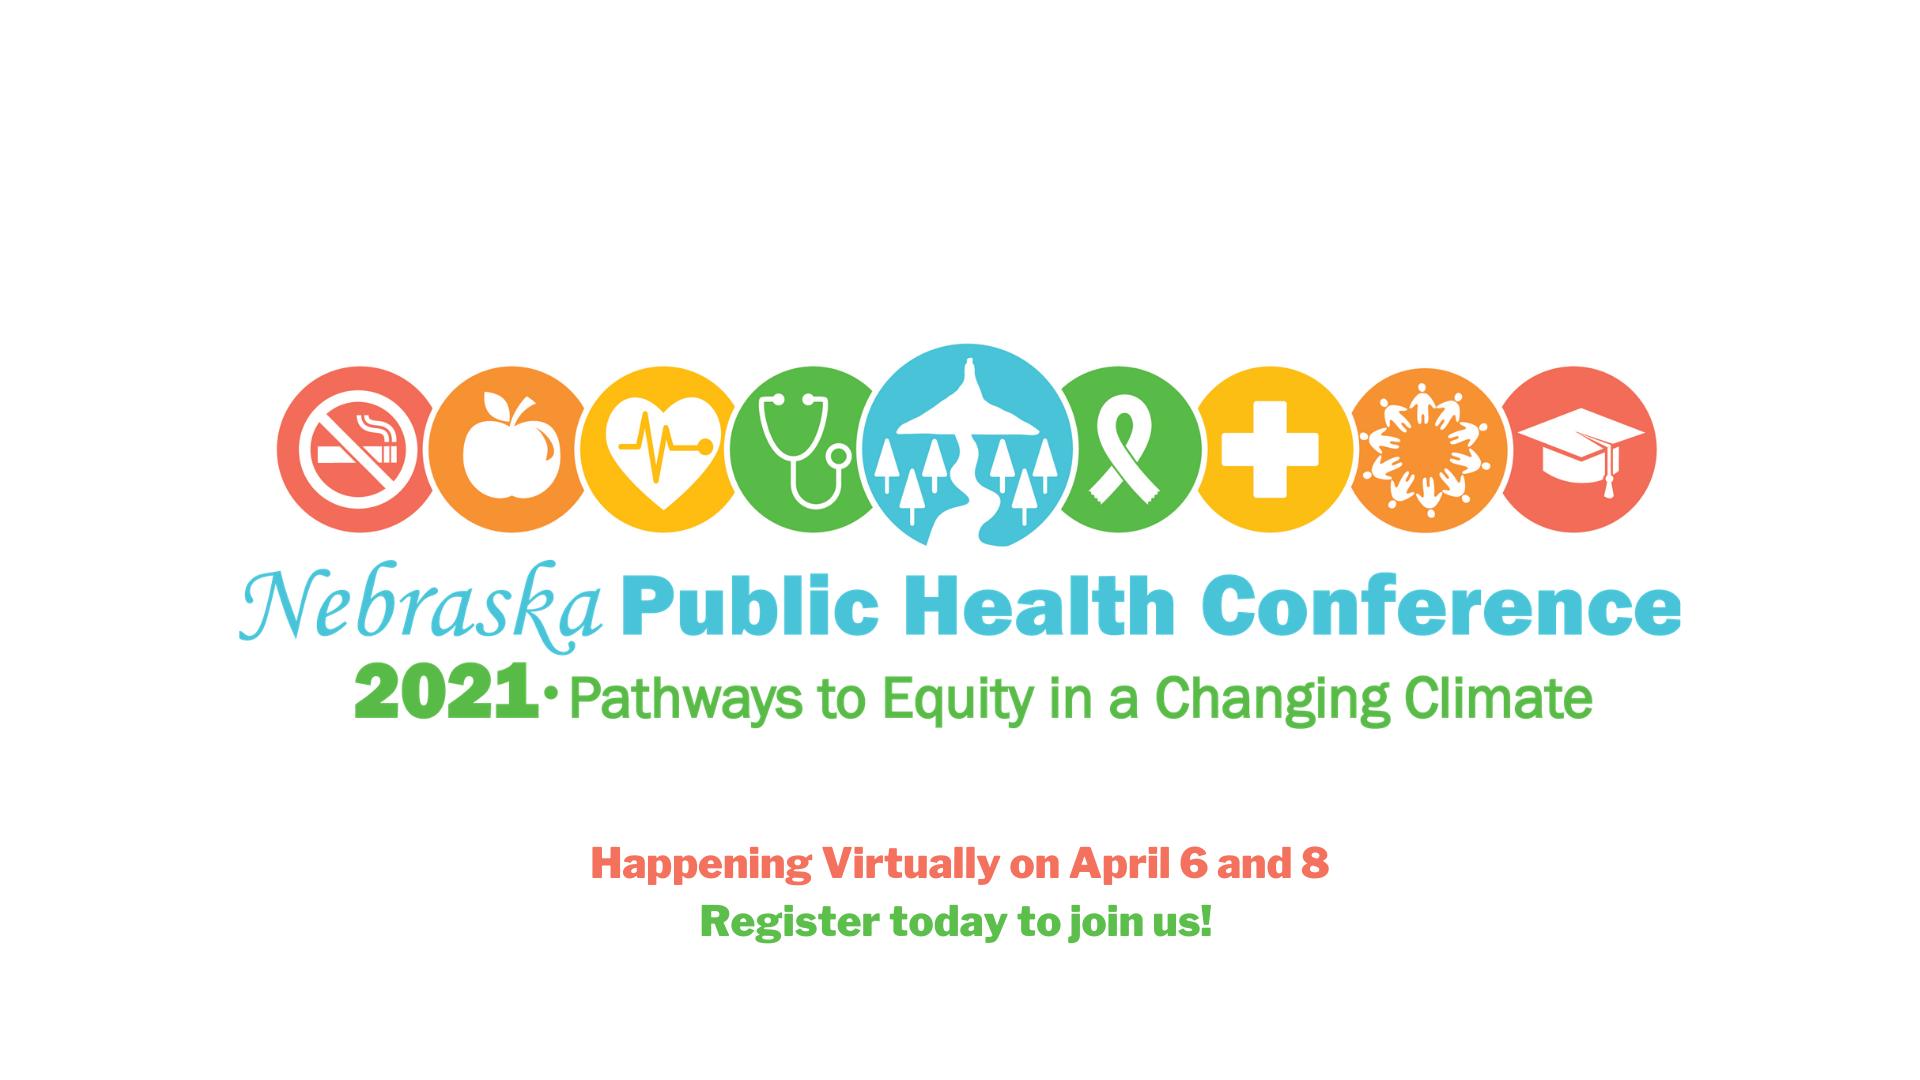 2021 Nebraska Public Health Conference